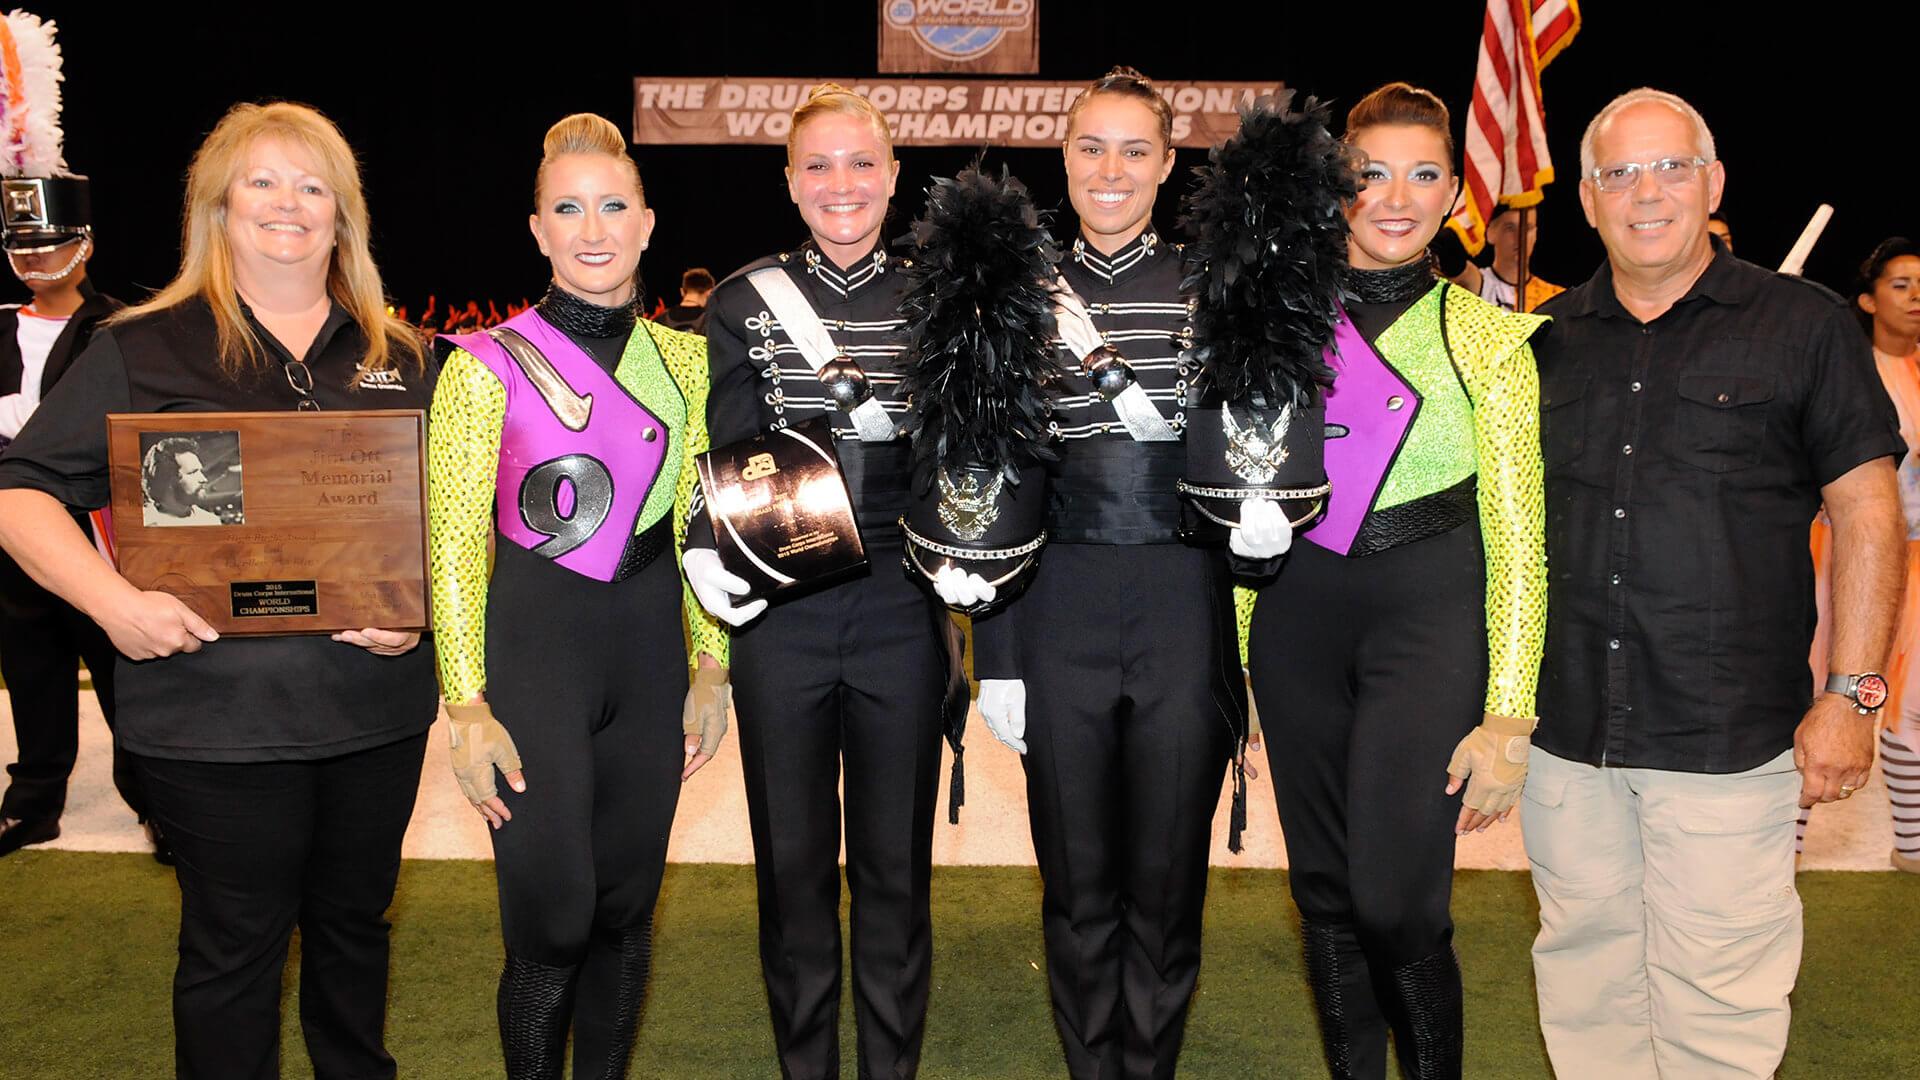 2015 DCI World Championship caption award winners